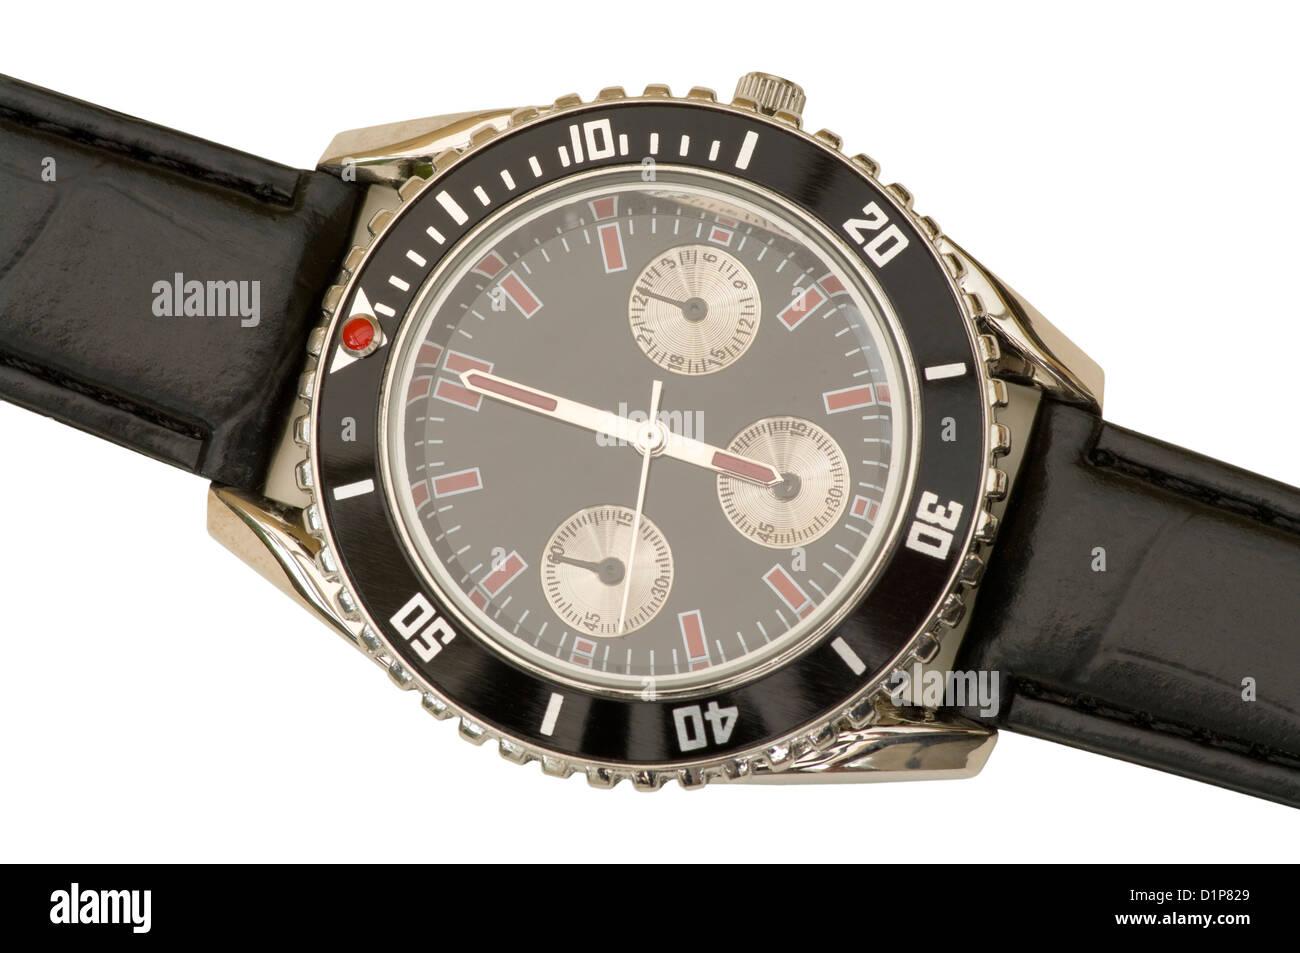 Mans Wristwatch Showing 6 O'Clock - Stock Image